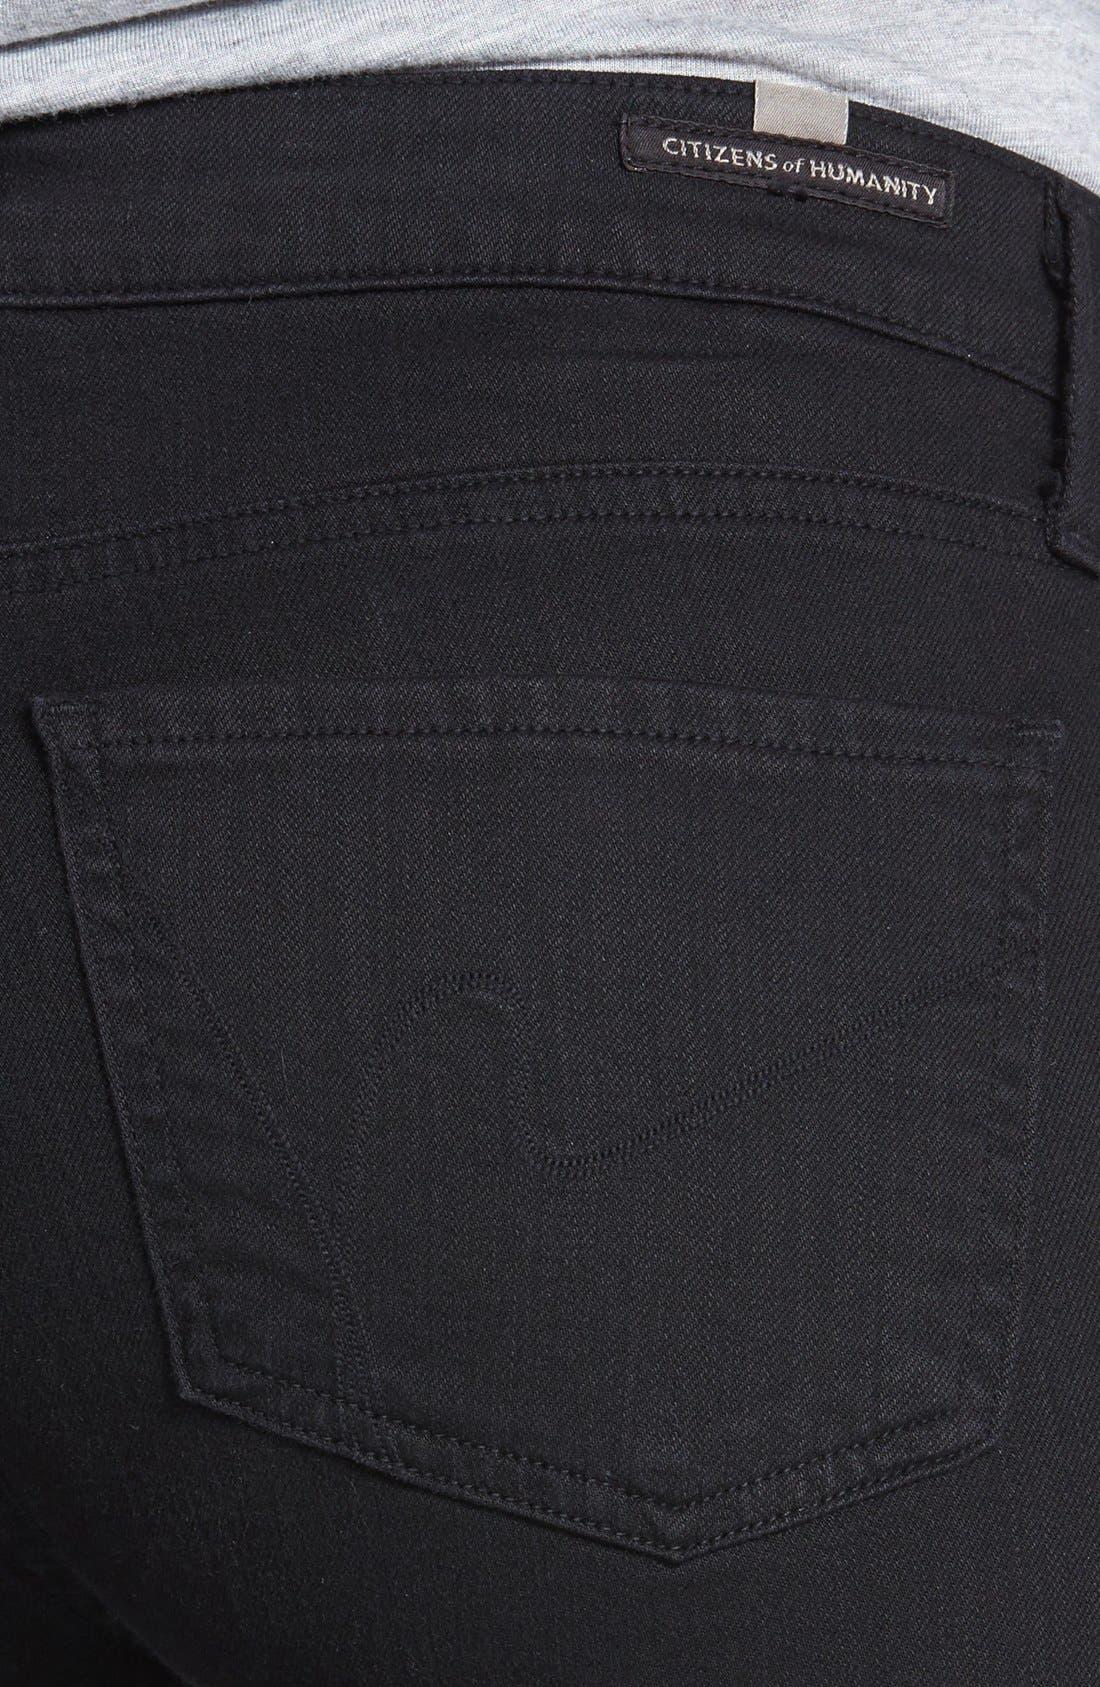 Alternate Image 3  - Citizens of Humanity Skinny Crop Jeans (Black Diamond)